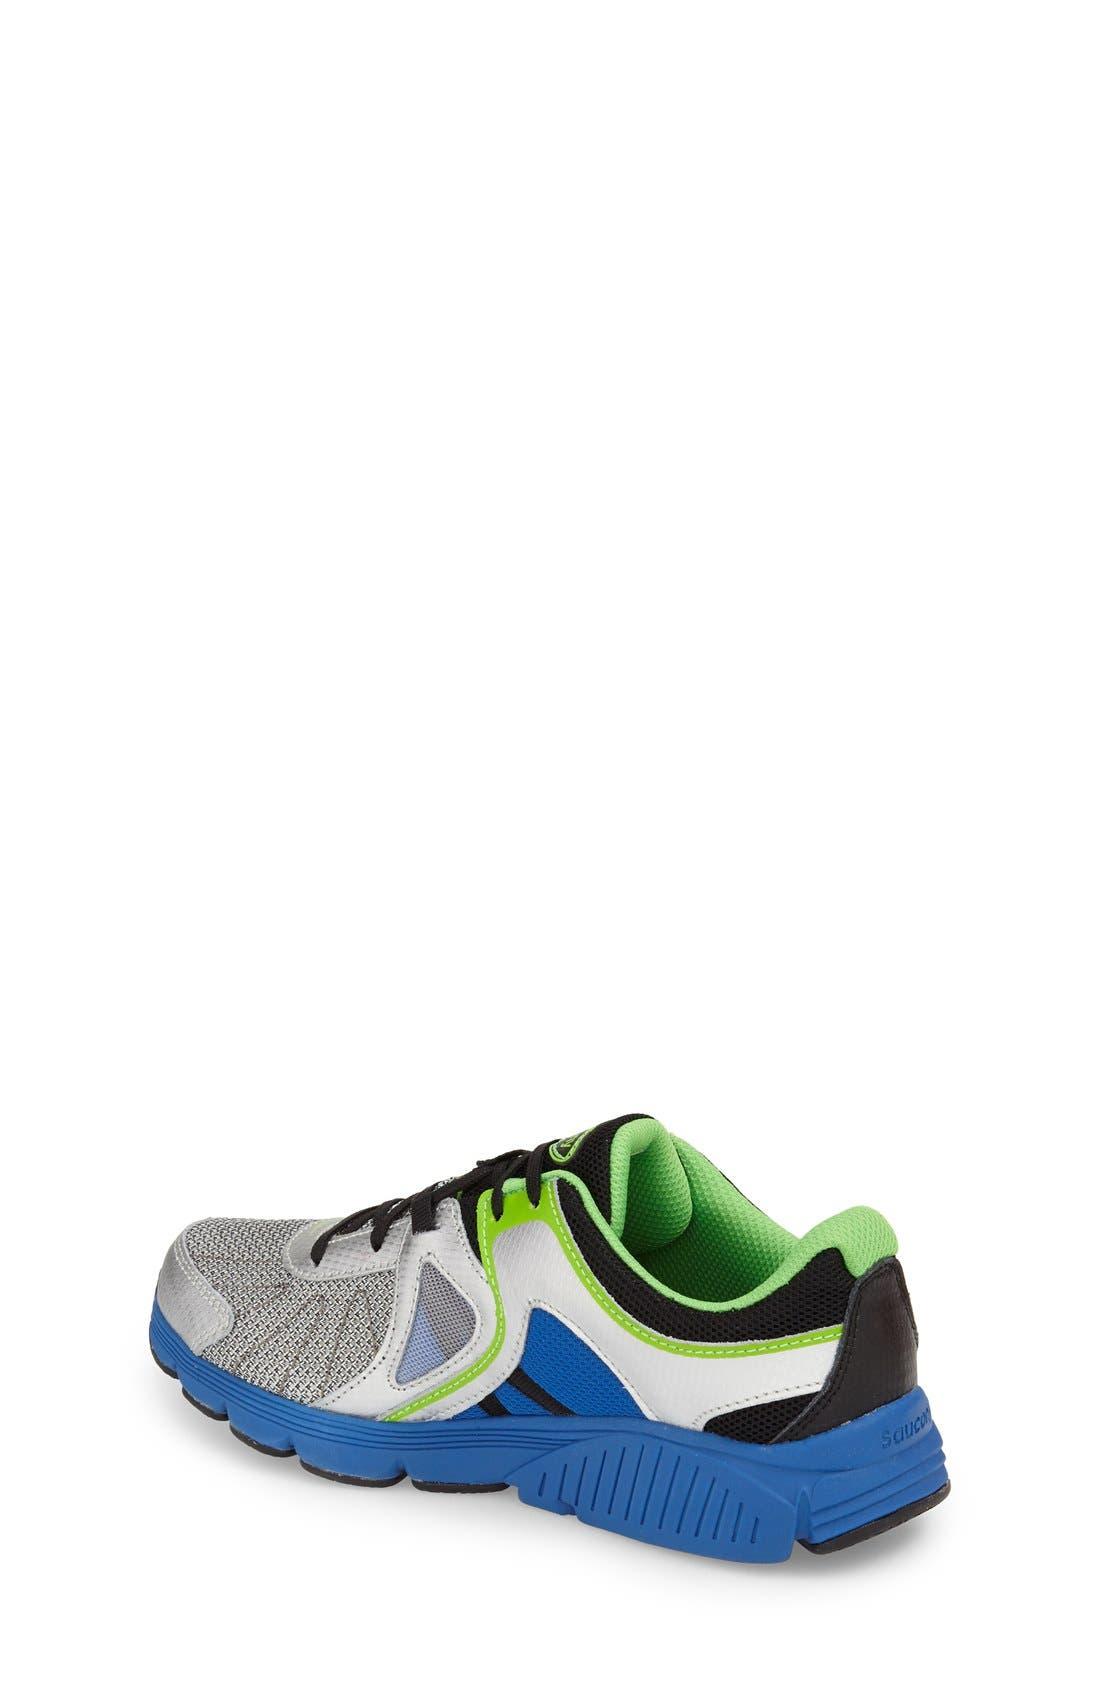 'Kotaro 3' Athletic Sneaker,                             Alternate thumbnail 2, color,                             040